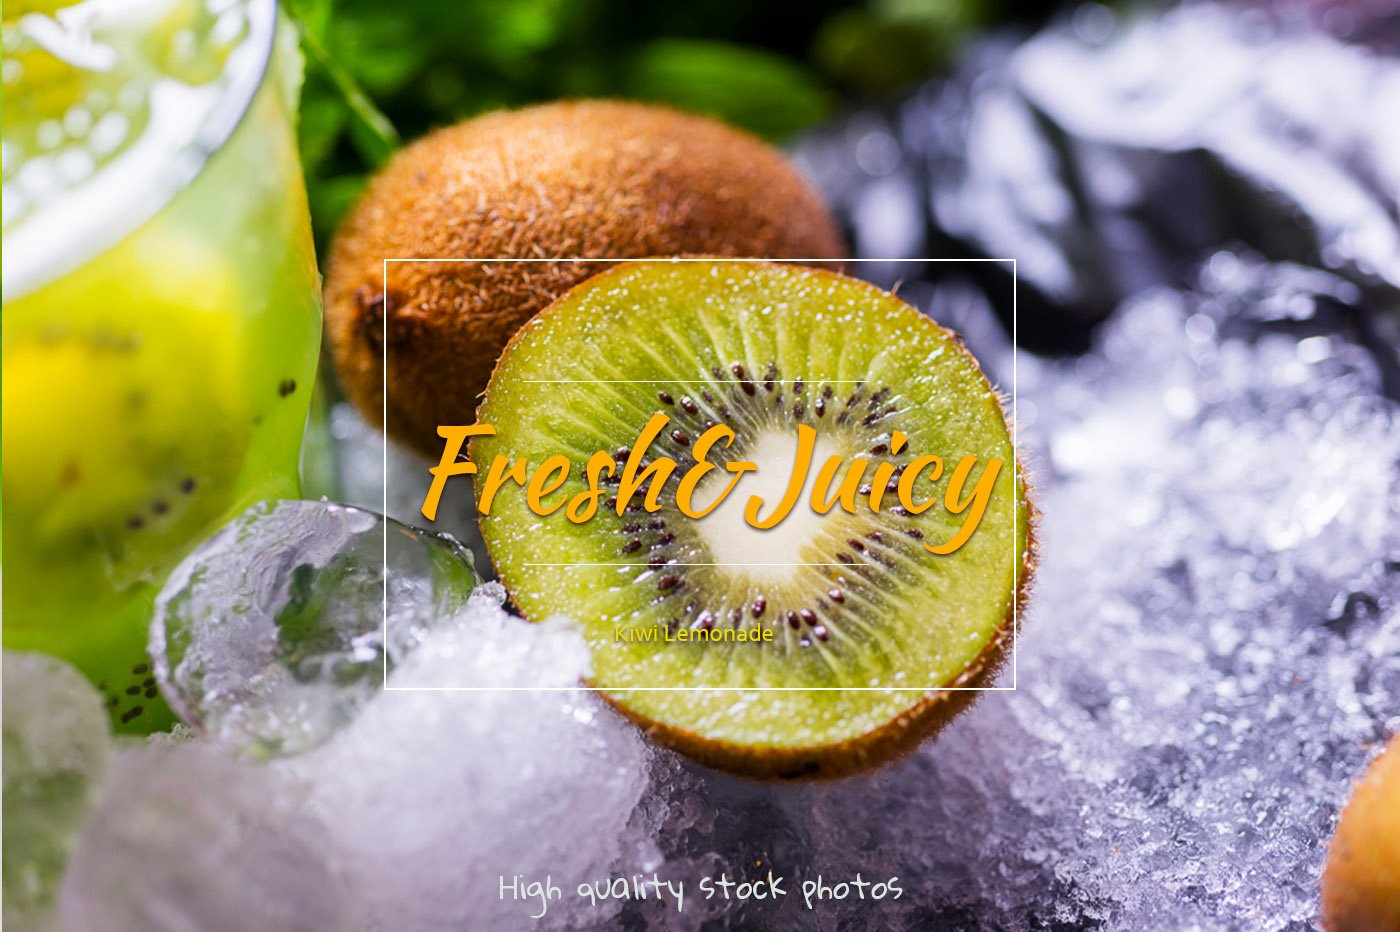 Kiwi lemonade. Fresh tropical drinks with ice and mint. example image 1